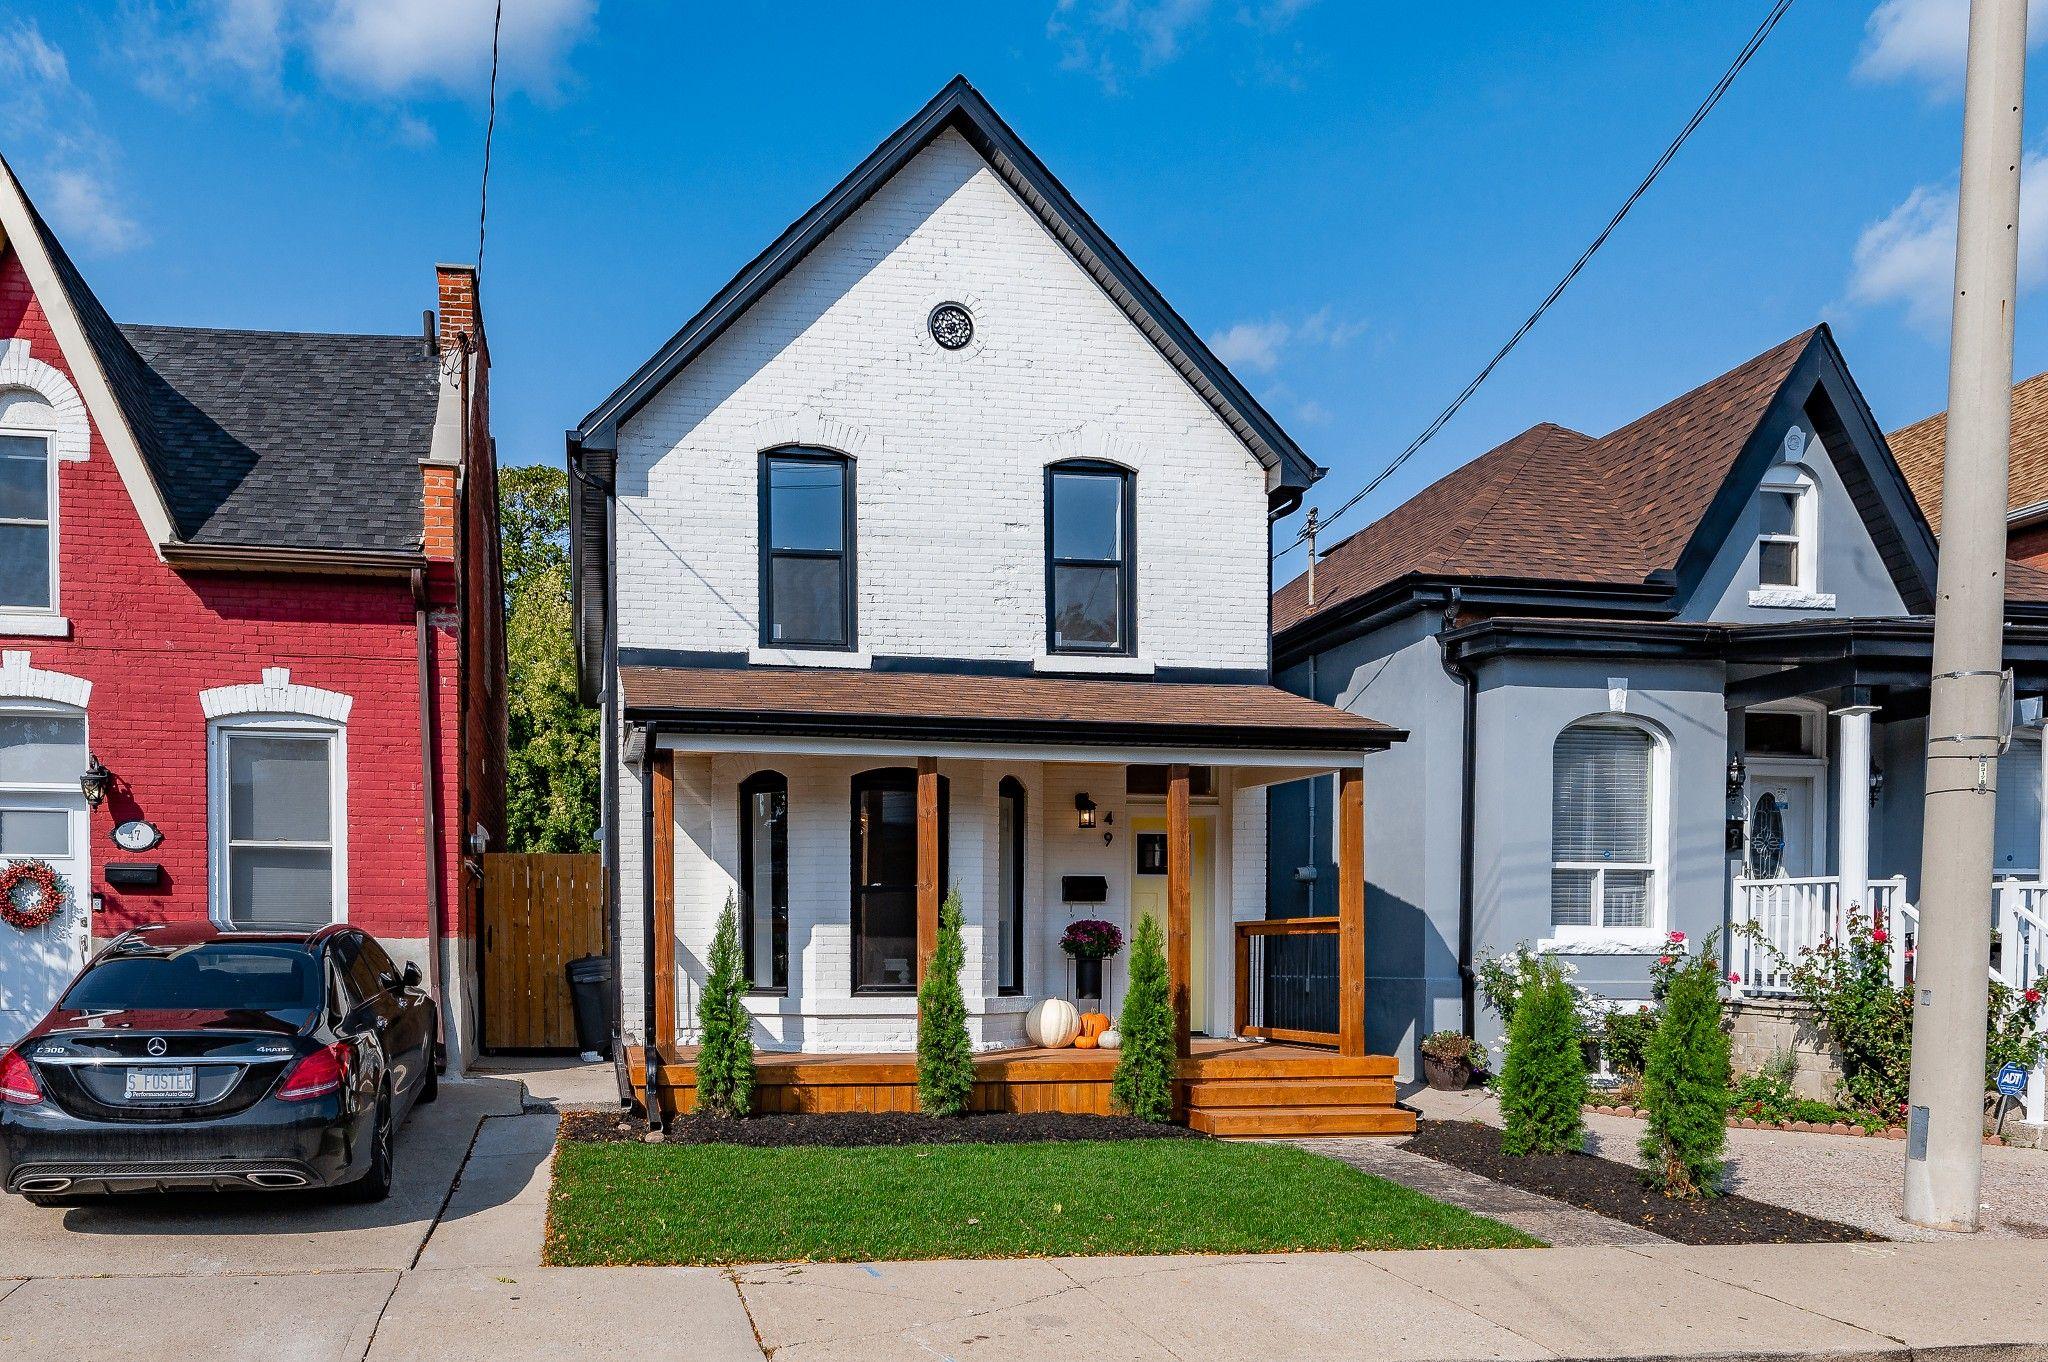 Main Photo: 49 Oak Avenue in Hamilton: House for sale : MLS®# H4090432